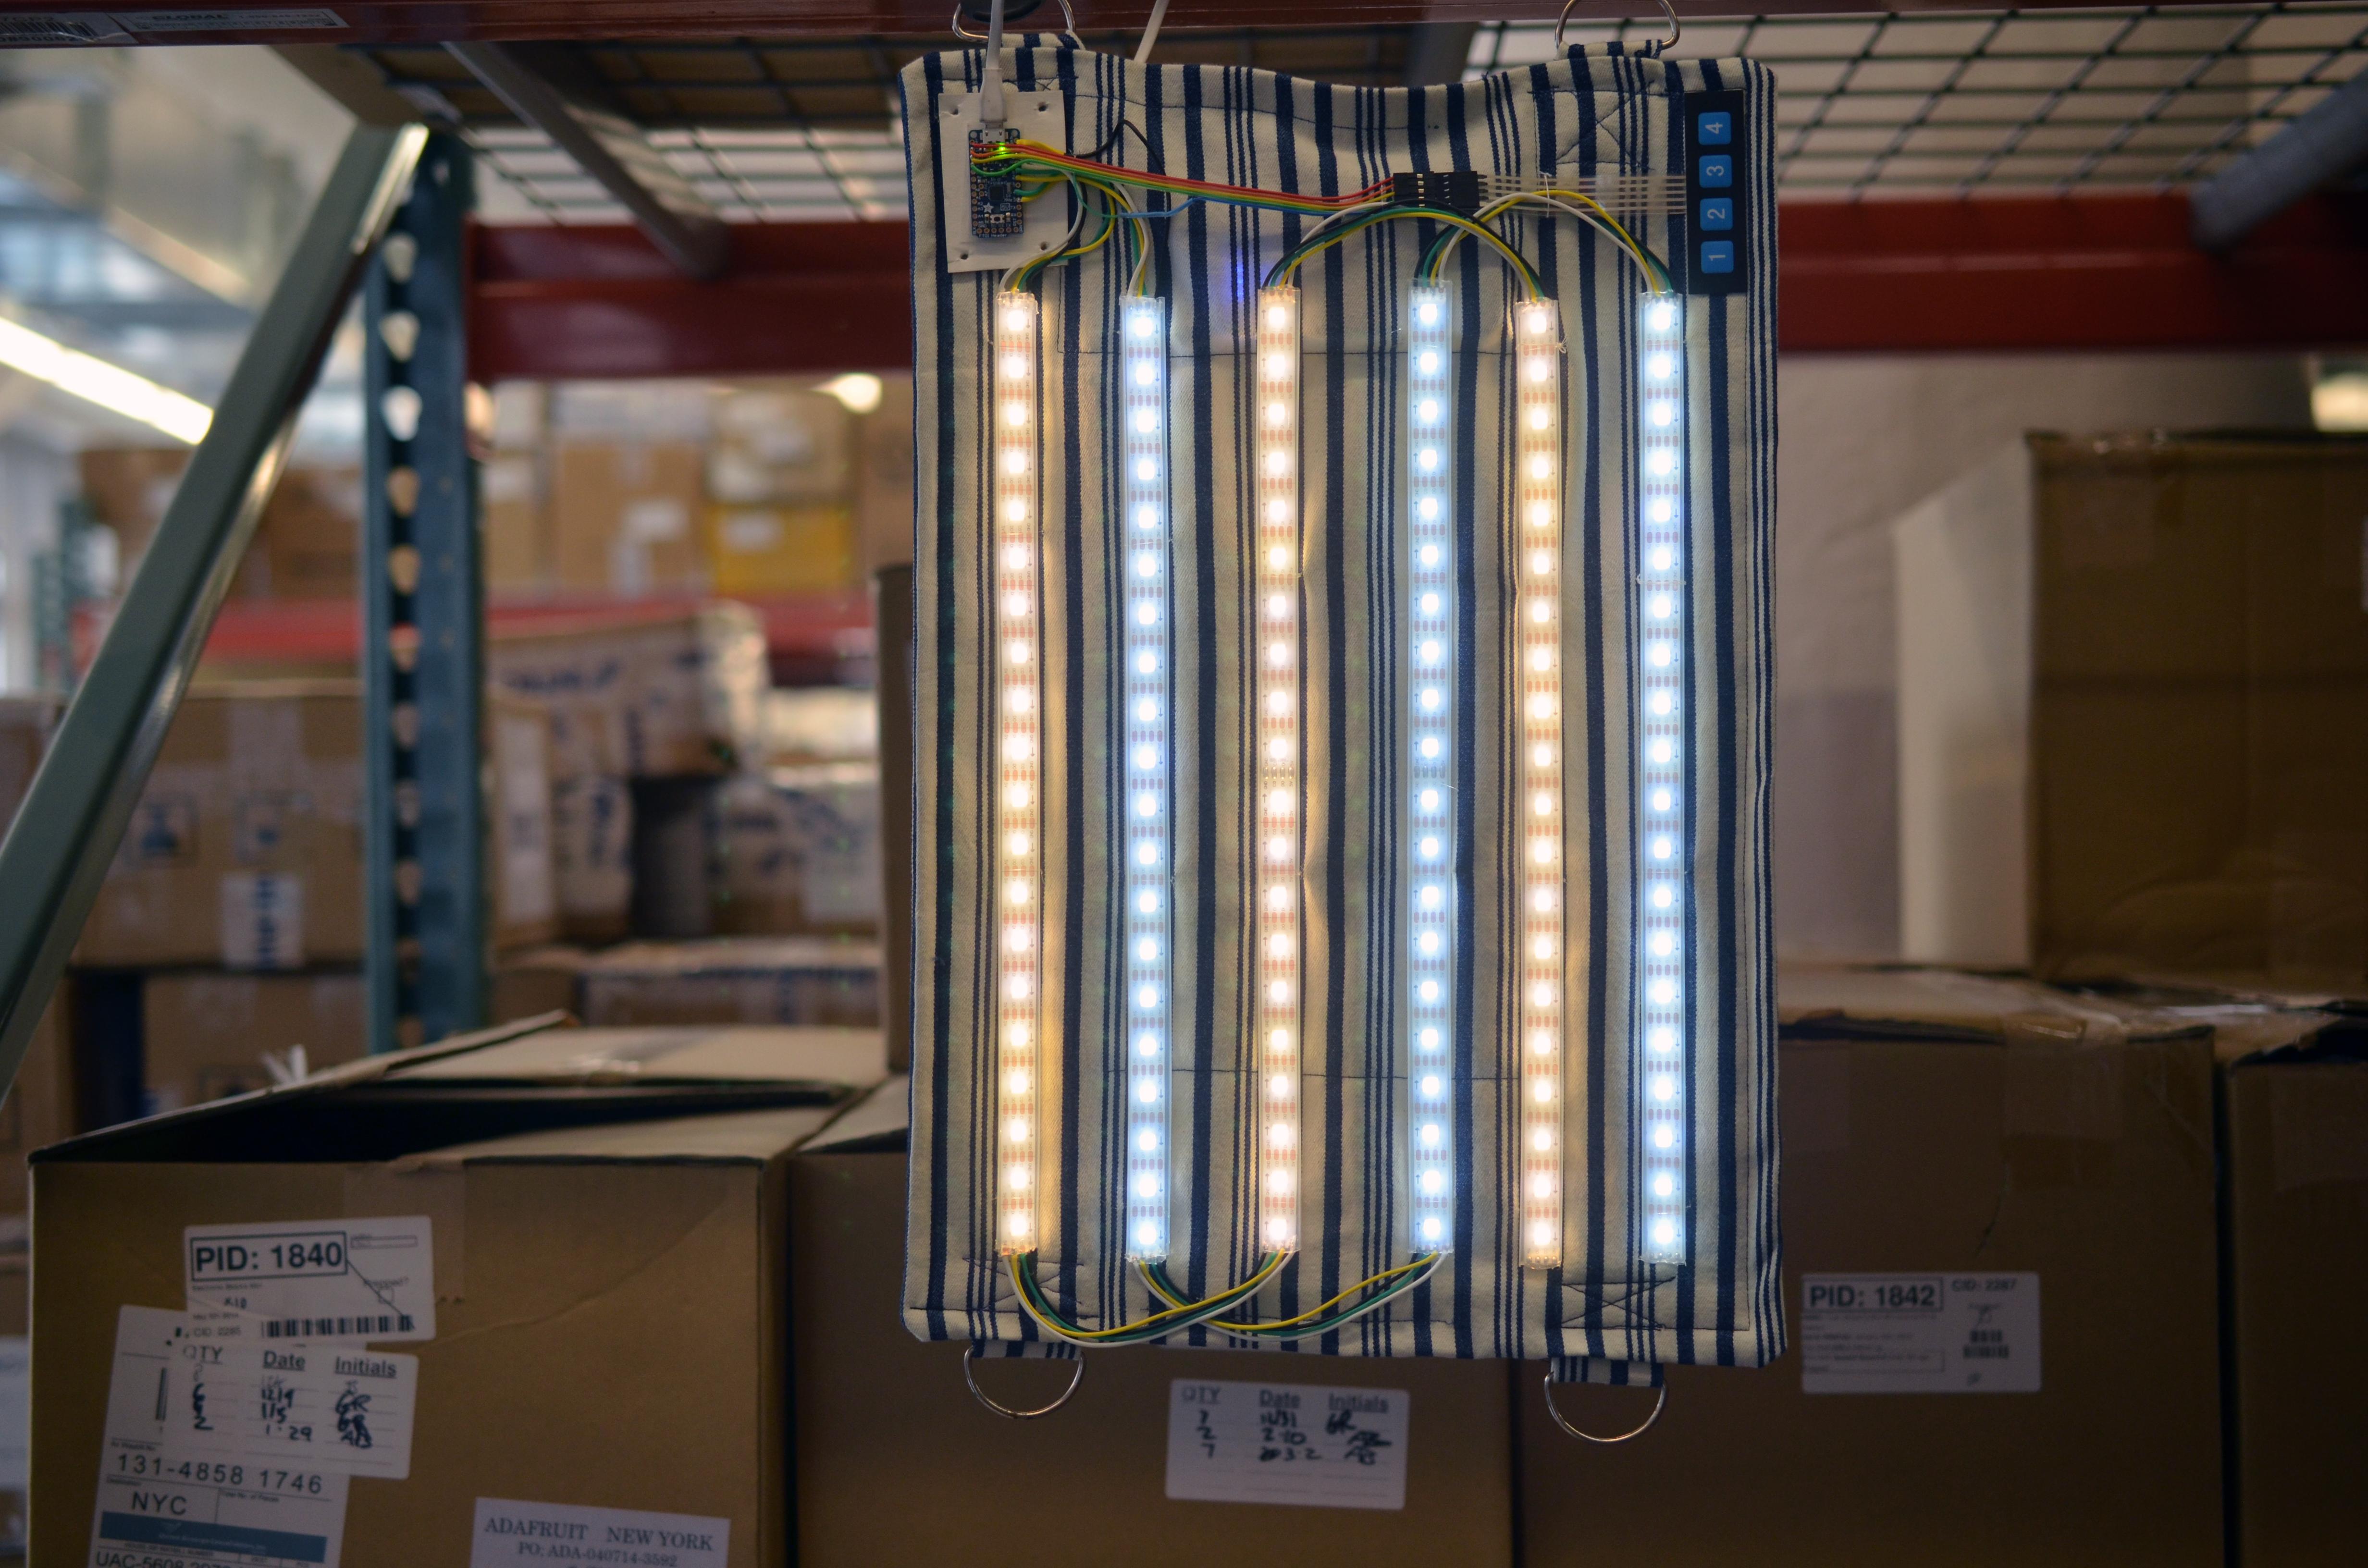 led_strips_roll-up-video-light-complete.jpg